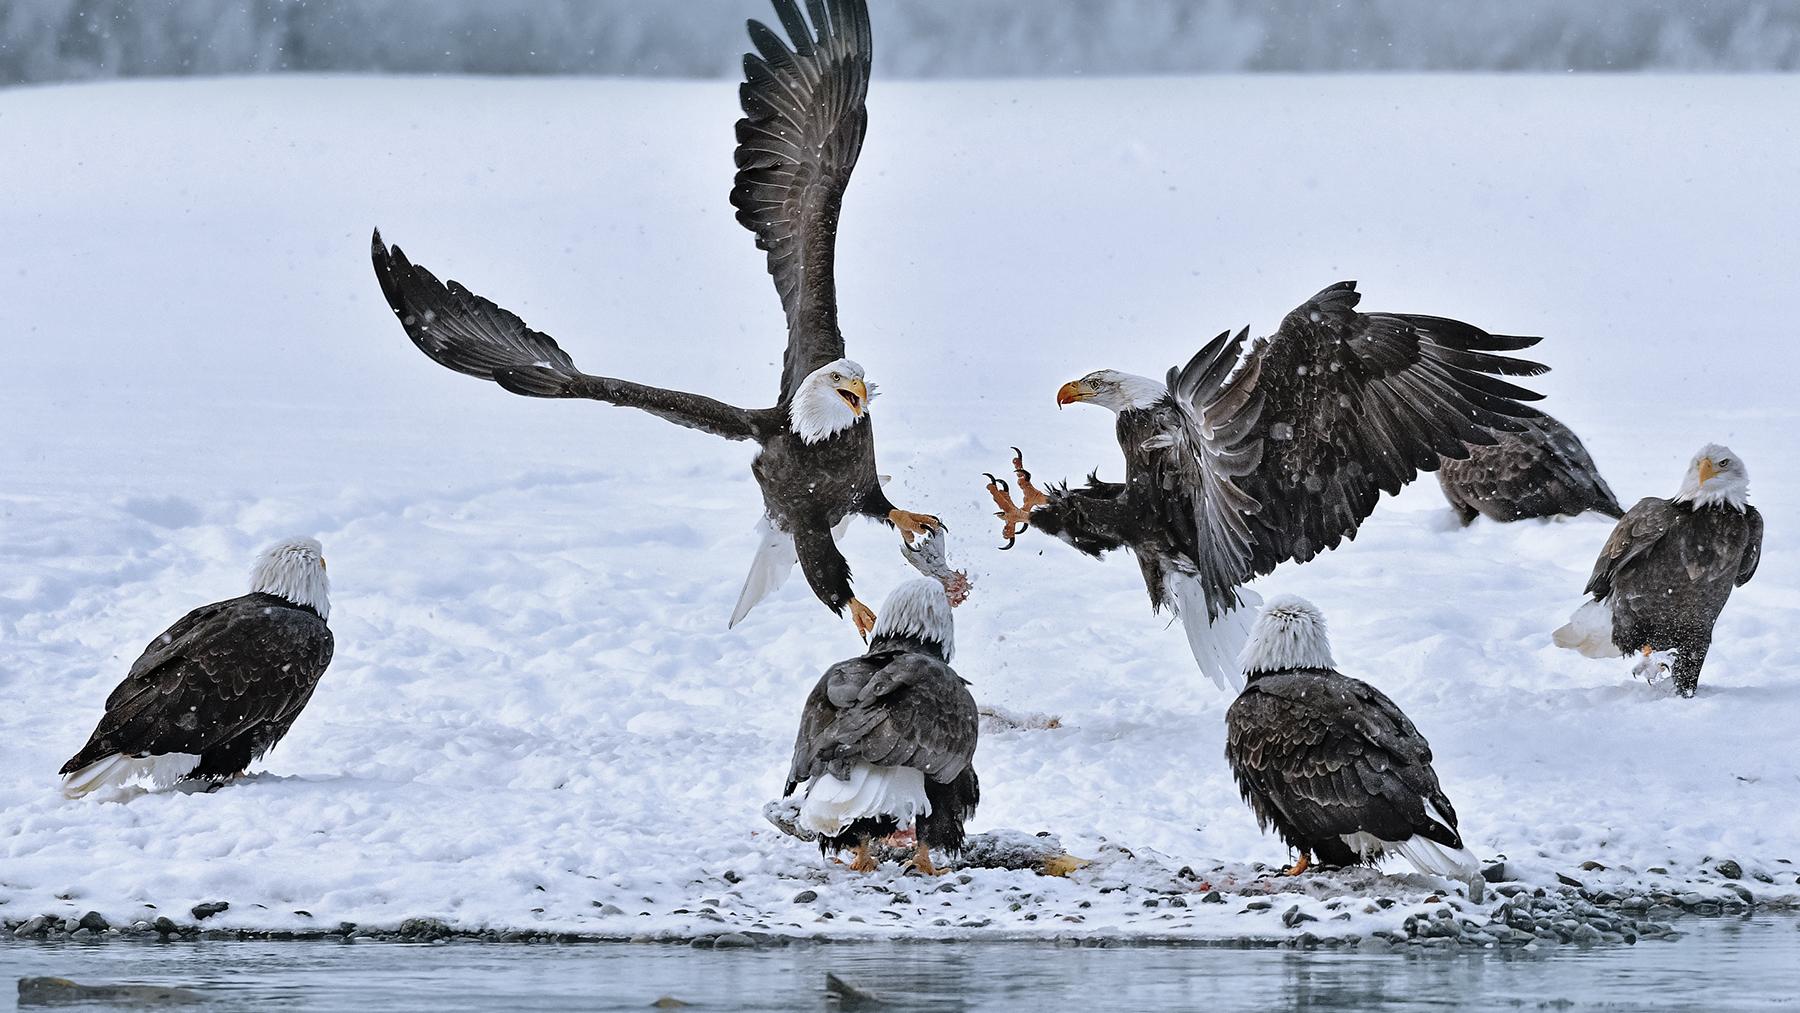 Bald eagles gathering on Chilkat River   Photo - Brian Rivera Uncapher